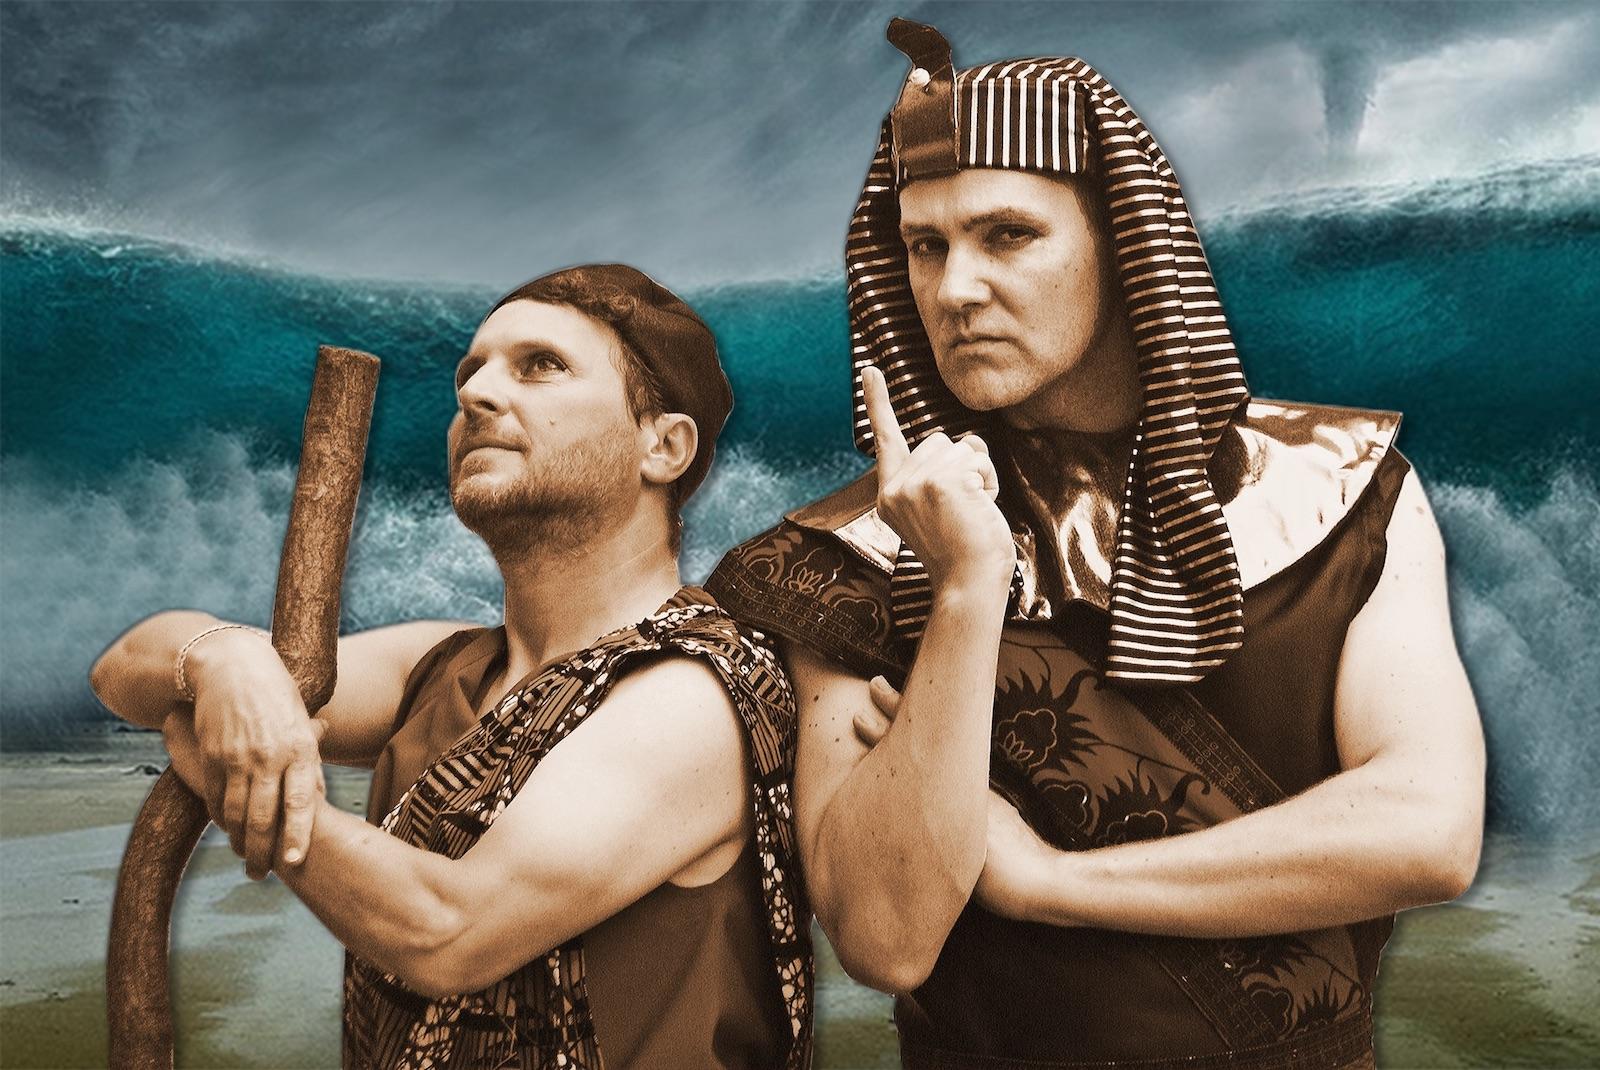 Moses Musical Pressefoto mit Frank Maier und Joe Sortine